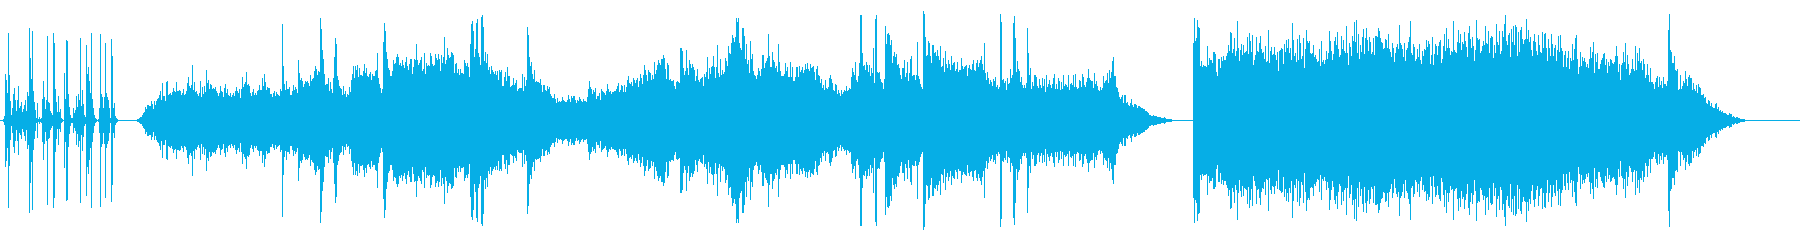 Cangasダウンロードの再生済みの波形